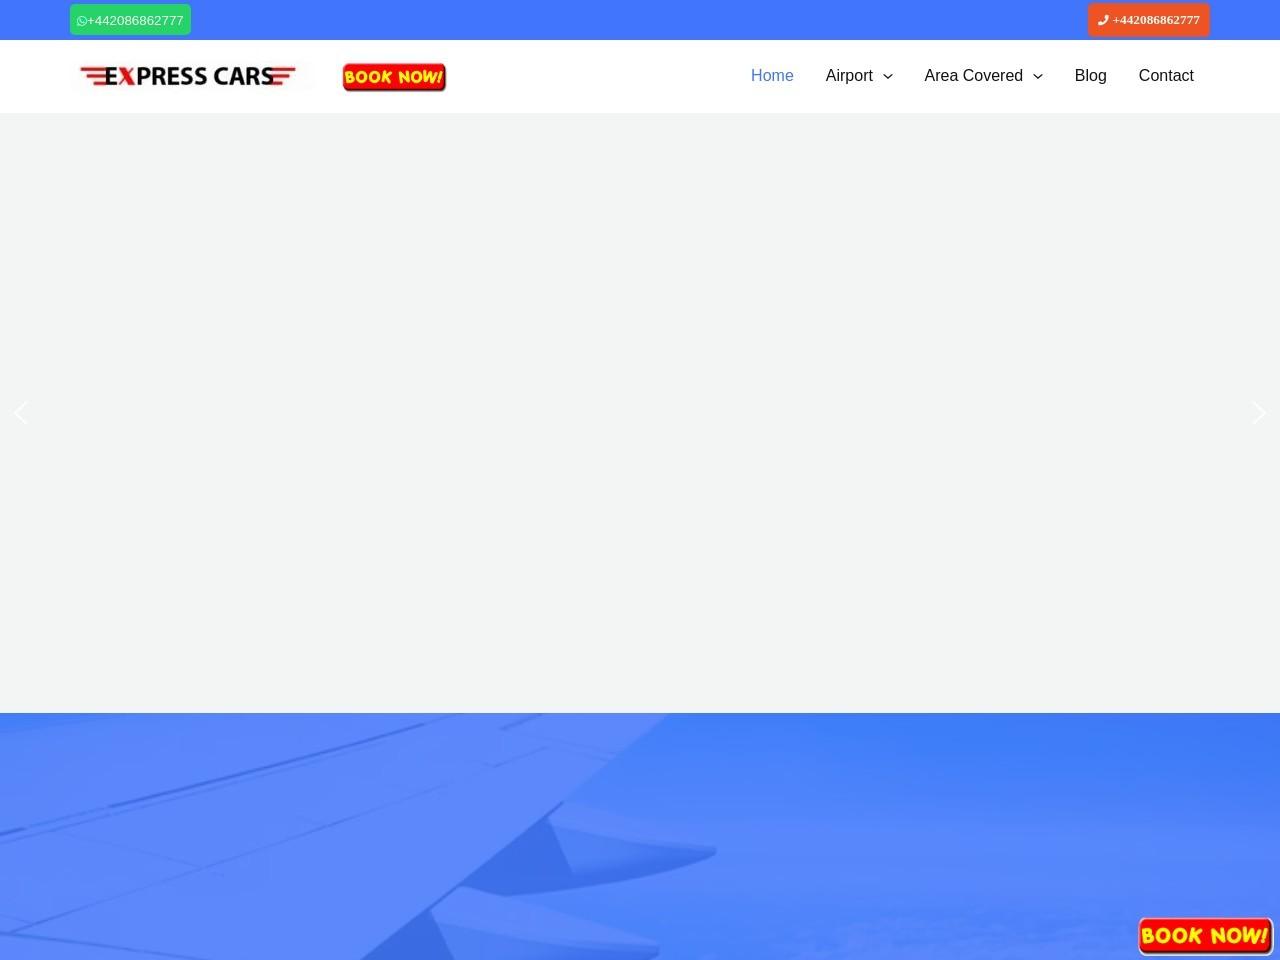 Croydon MiniCab Taxi Service -02086862777